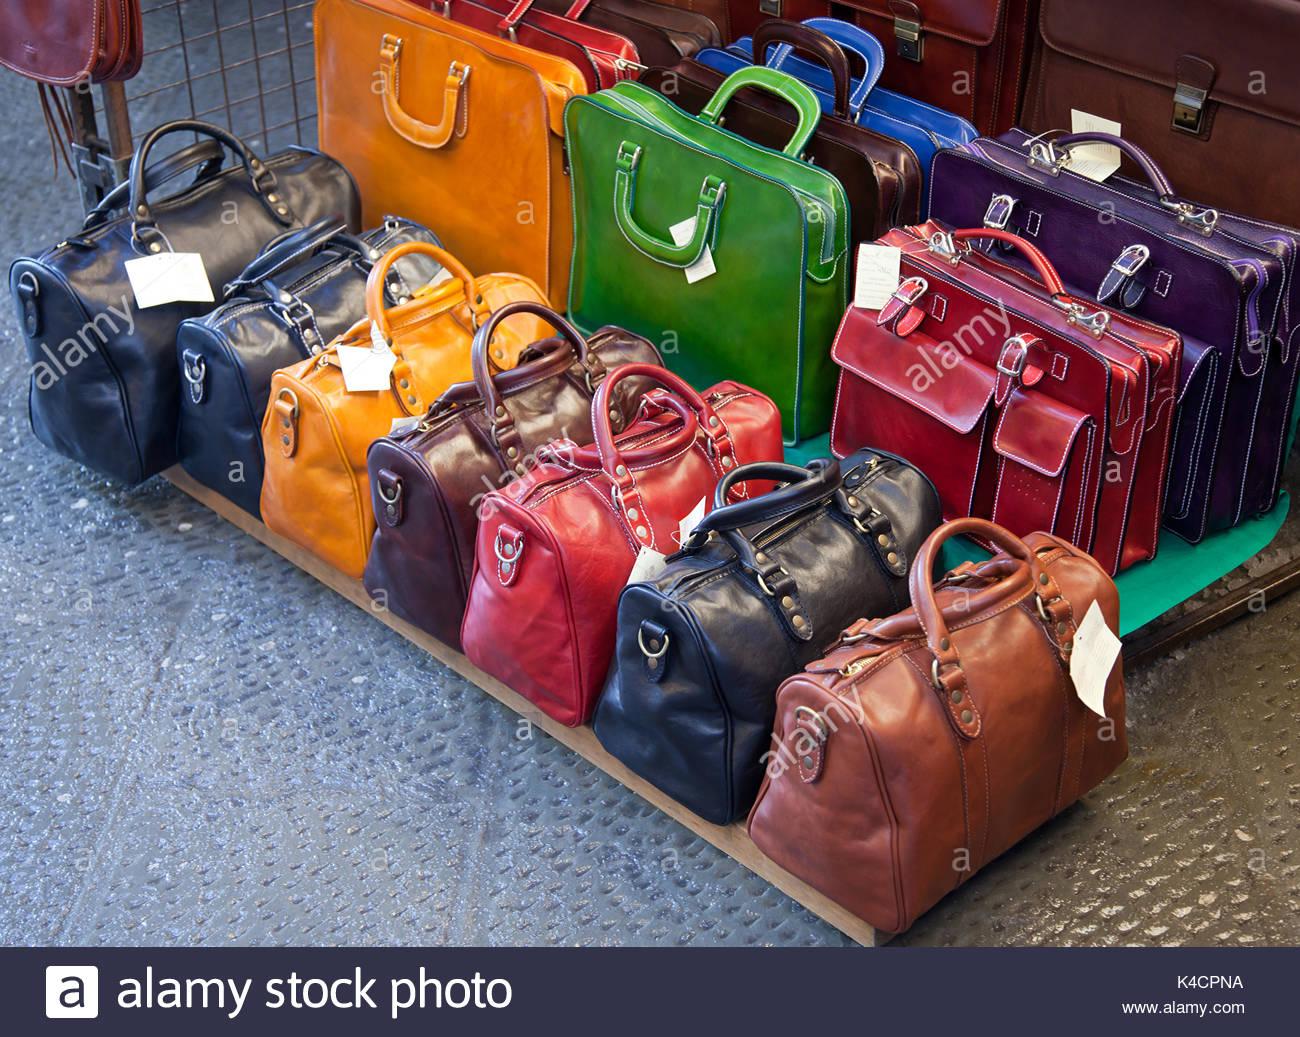 Borse in pelle per la vendita in mercati di Firenze 6fea9ad627a